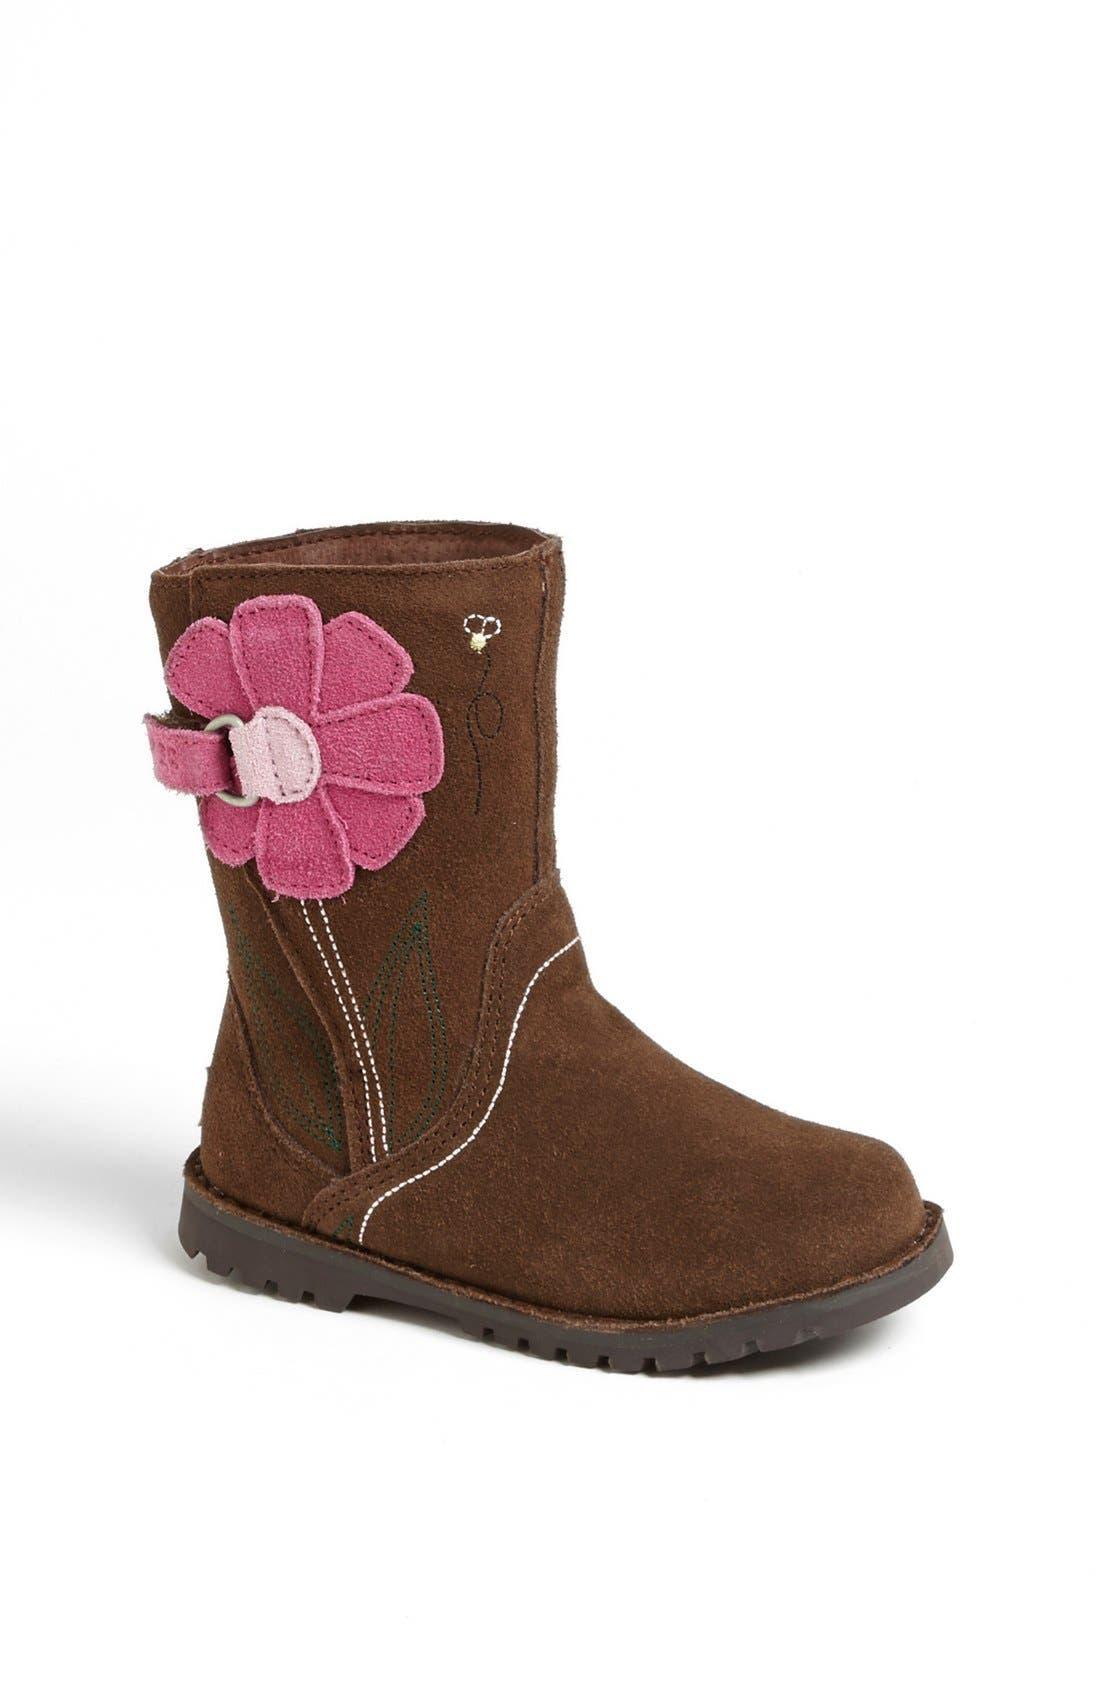 Alternate Image 1 Selected - UGG® Australia 'Blossom' Boot (Walker & Toddler)